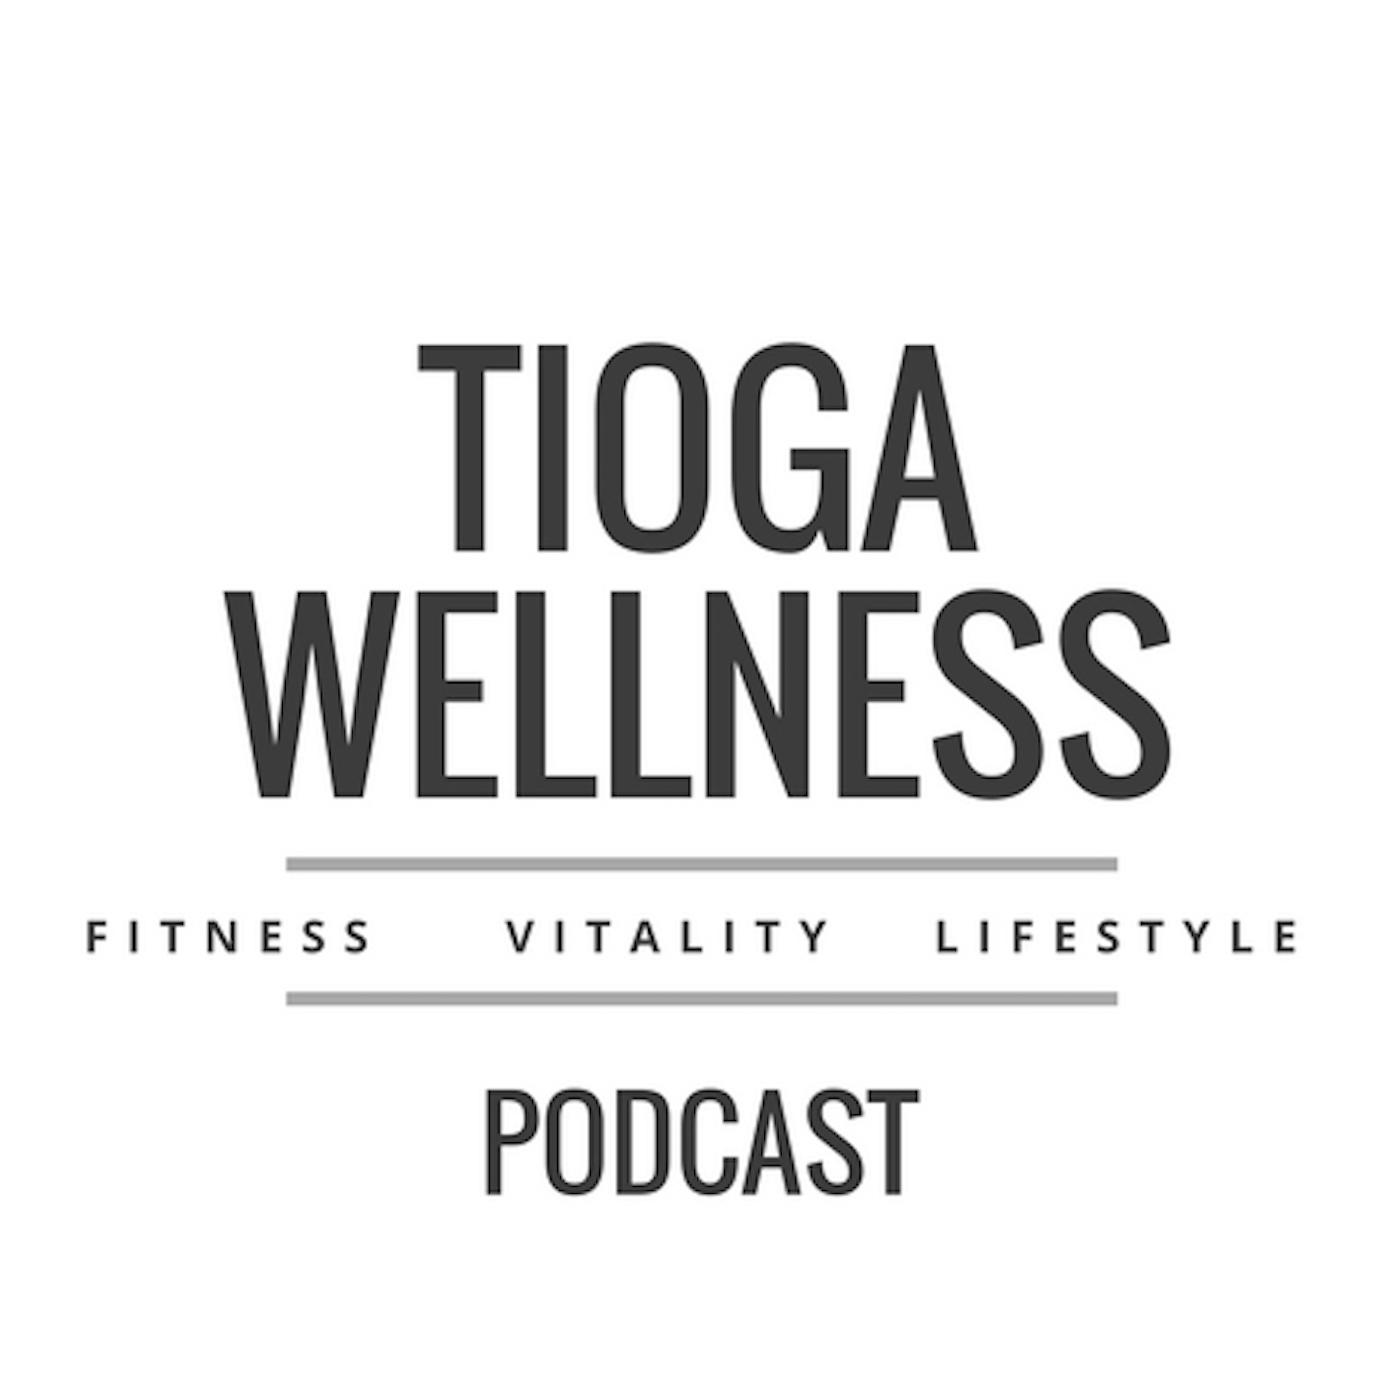 The Tioga Wellness Podcast show art